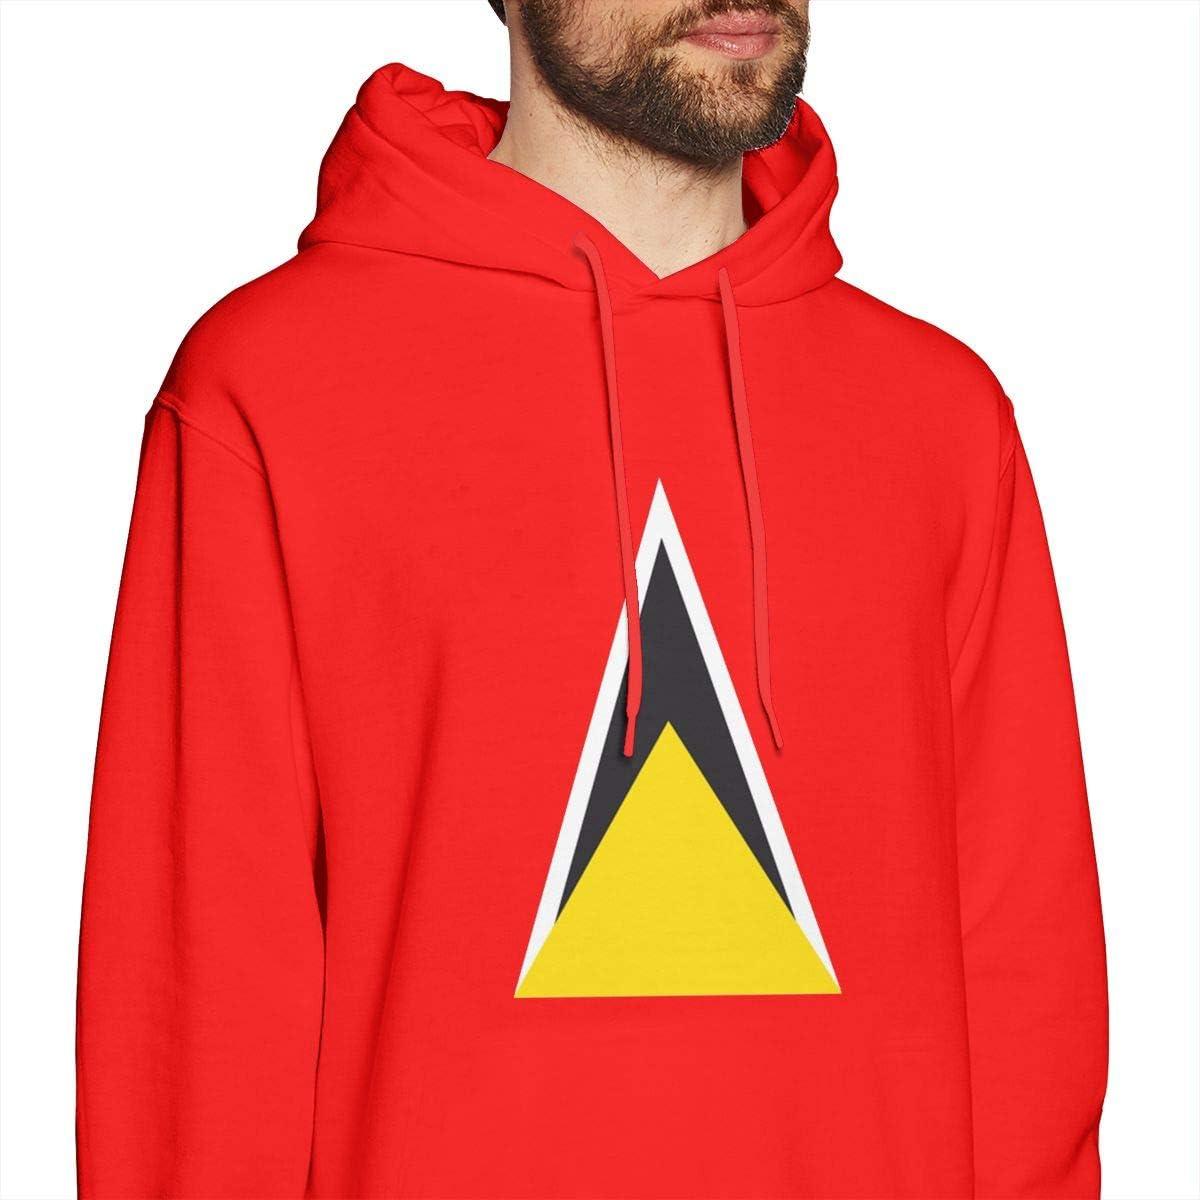 Mens Hoodies Saint Lucias Flag Best Pullover Hooded Print Sweatshirt Jackets